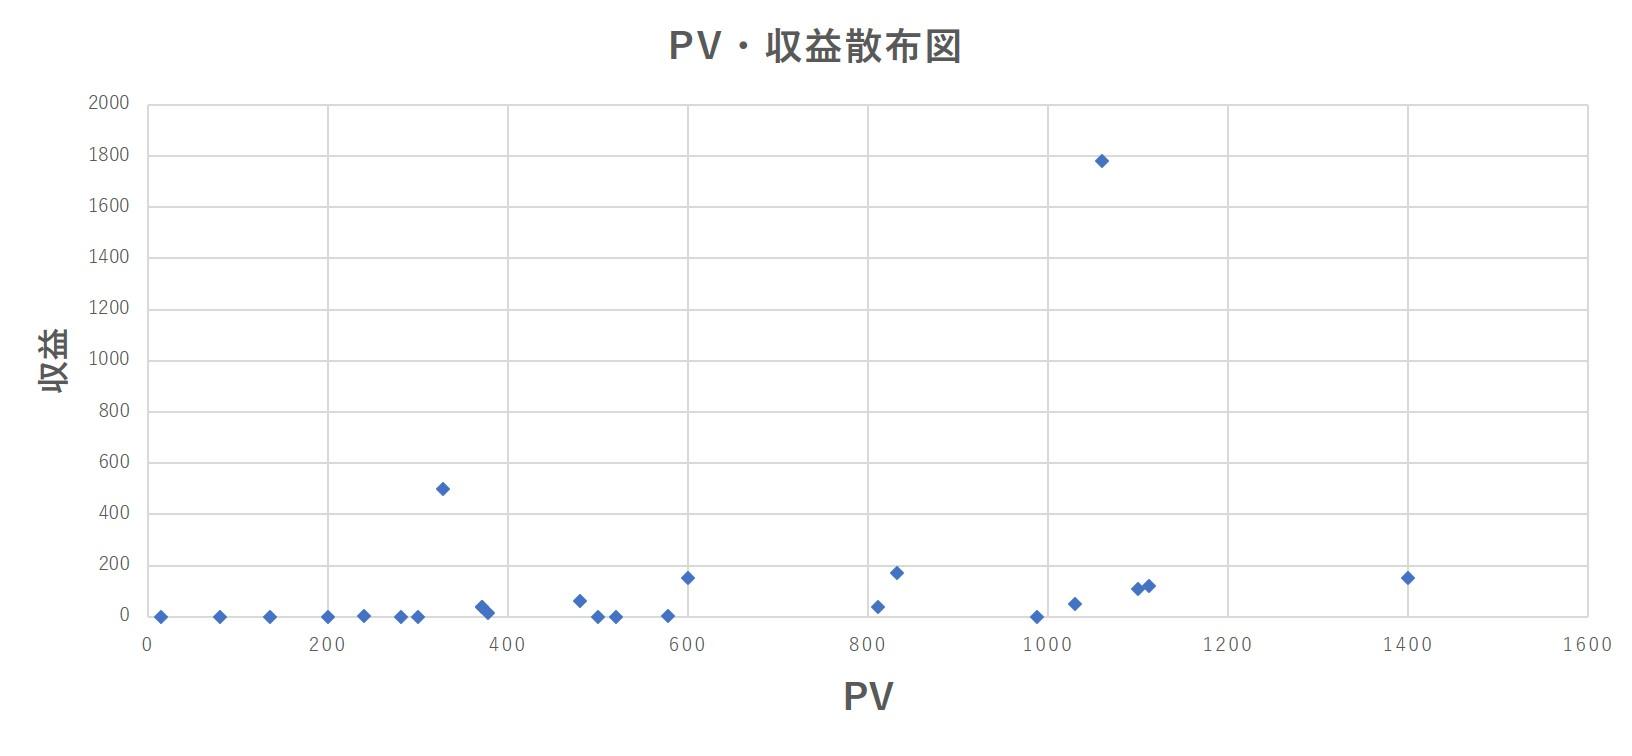 収益・PV散布図(PV2000以下)